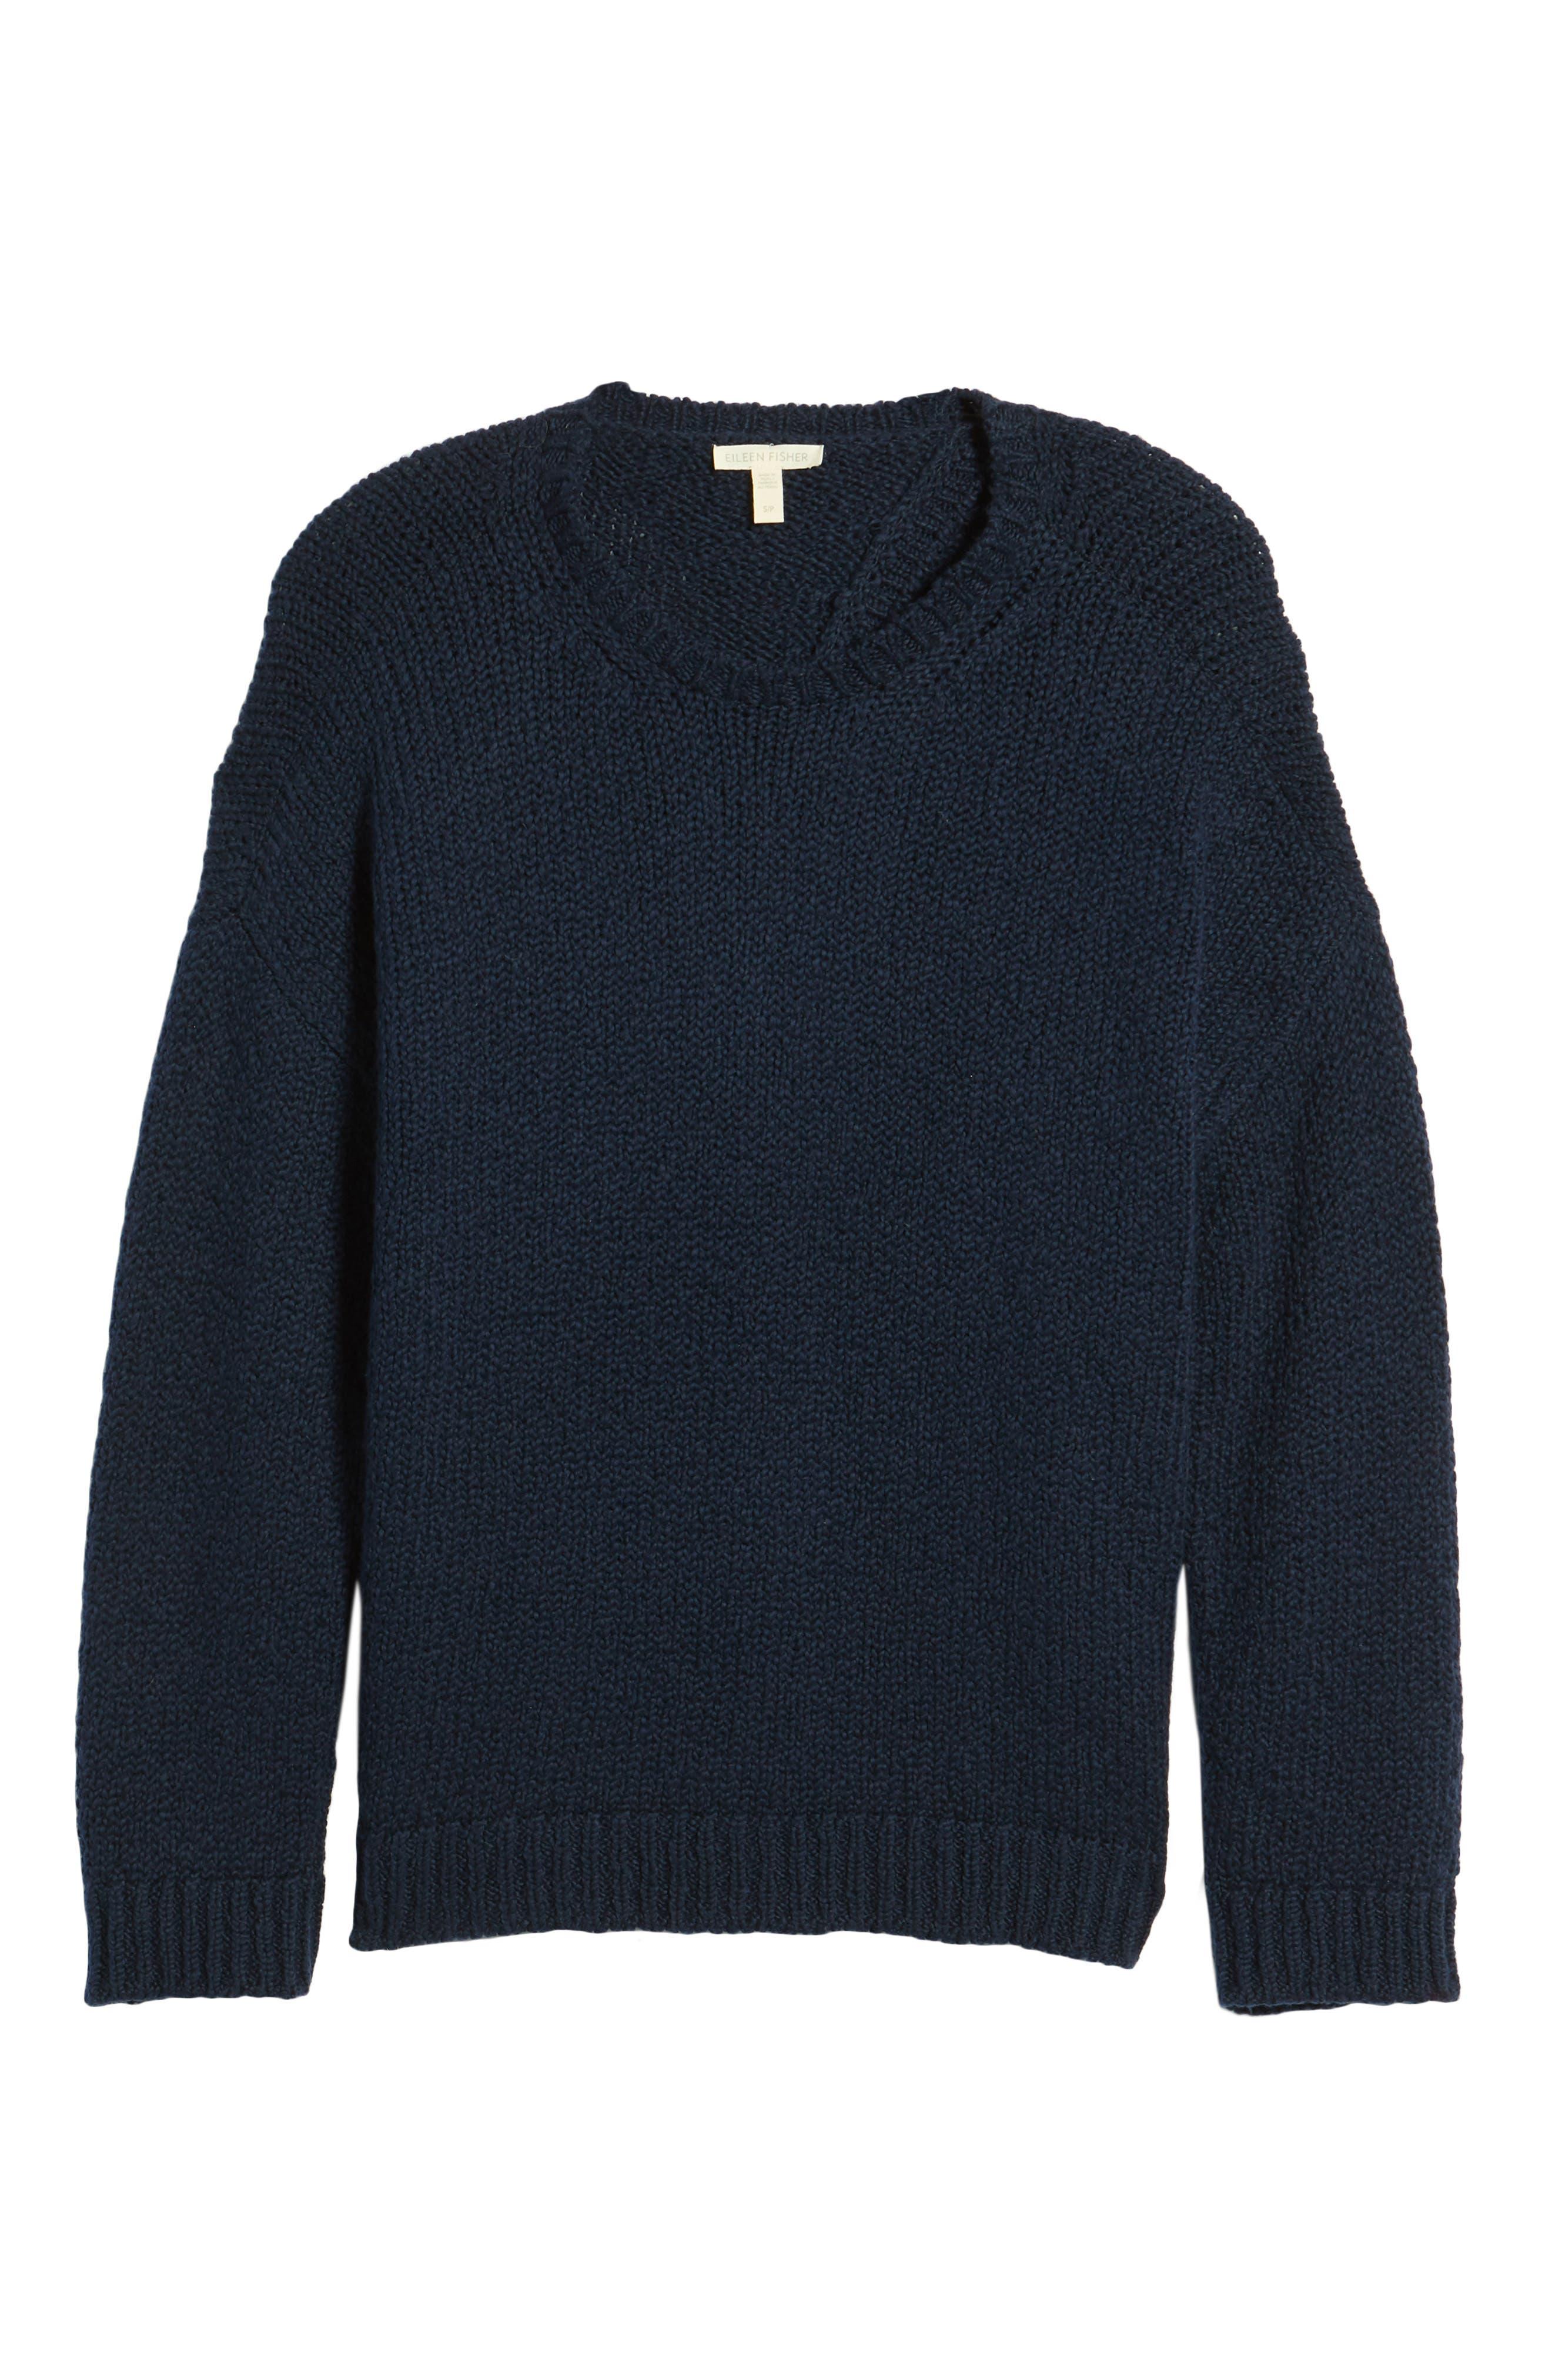 Organic Cotton Crewneck Sweater,                             Alternate thumbnail 5, color,                             Midnight